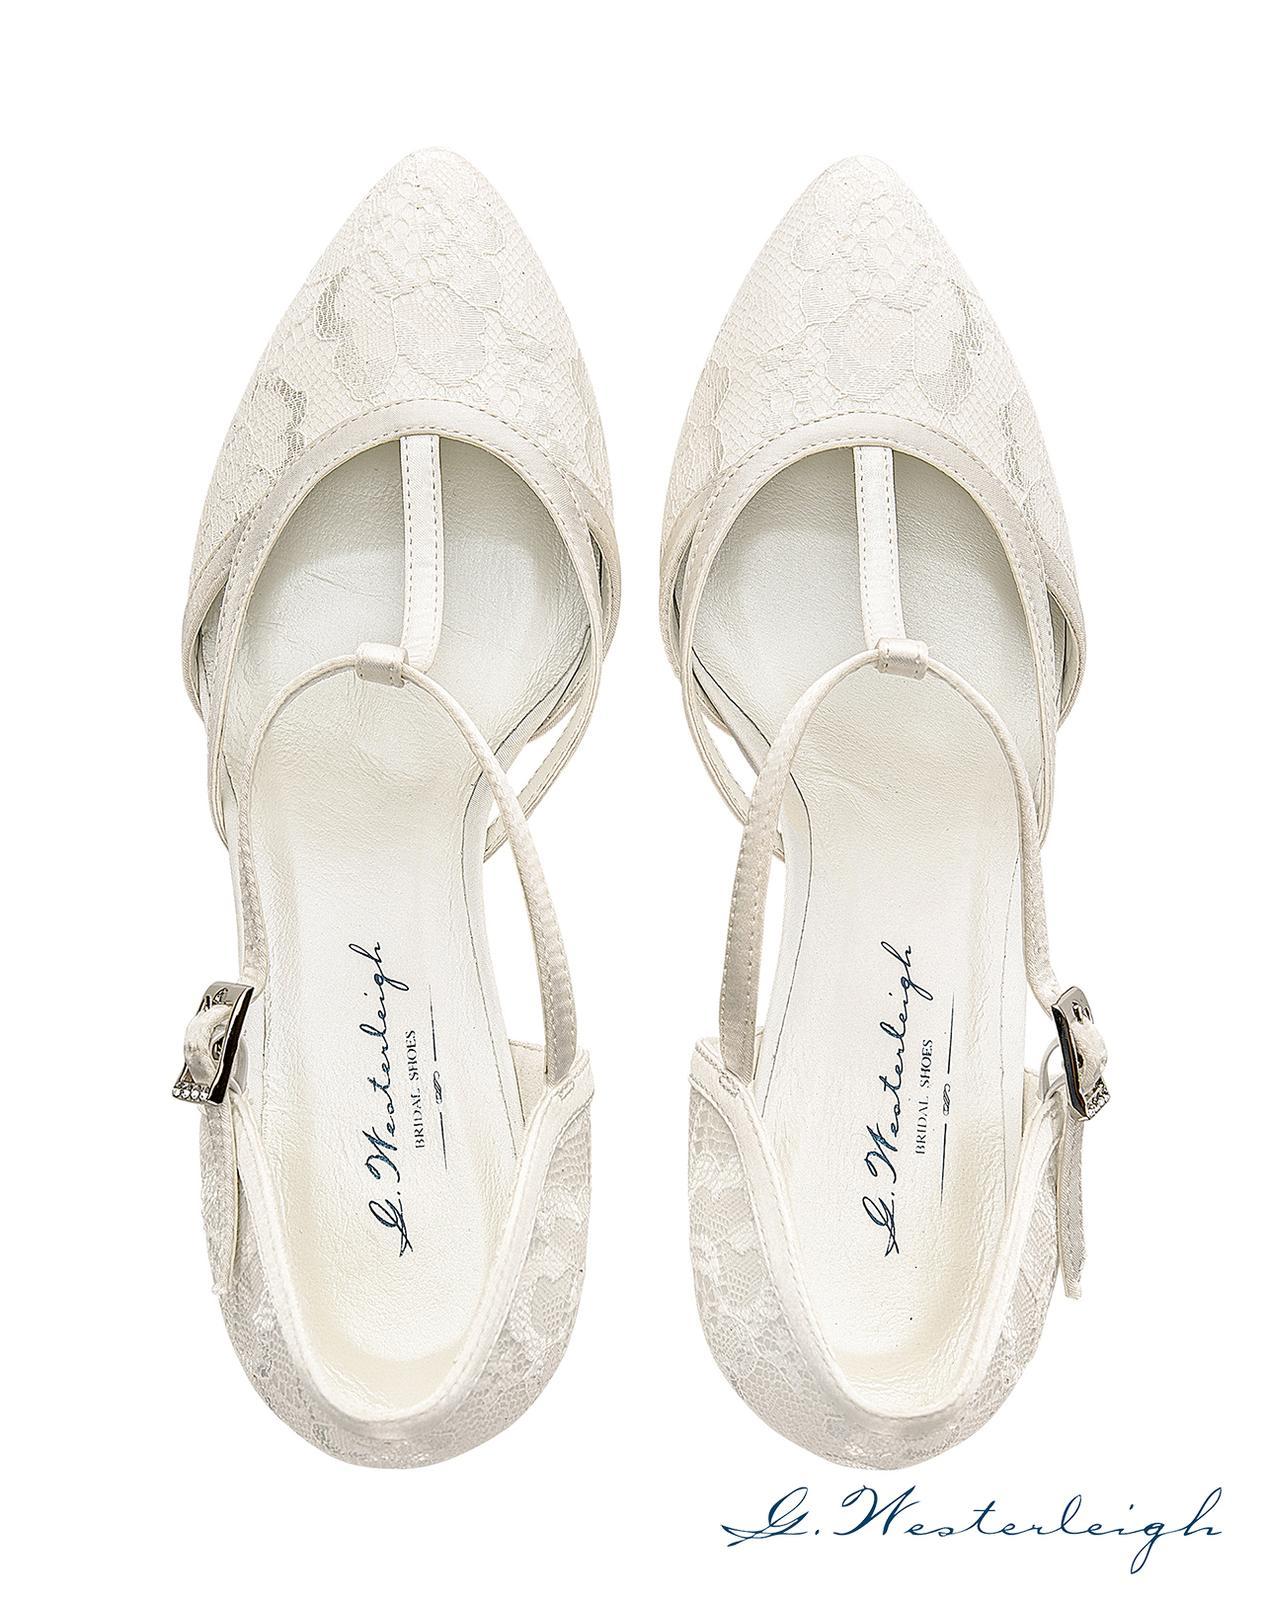 Svadobné topánky Jasmine - Obrázok č. 3